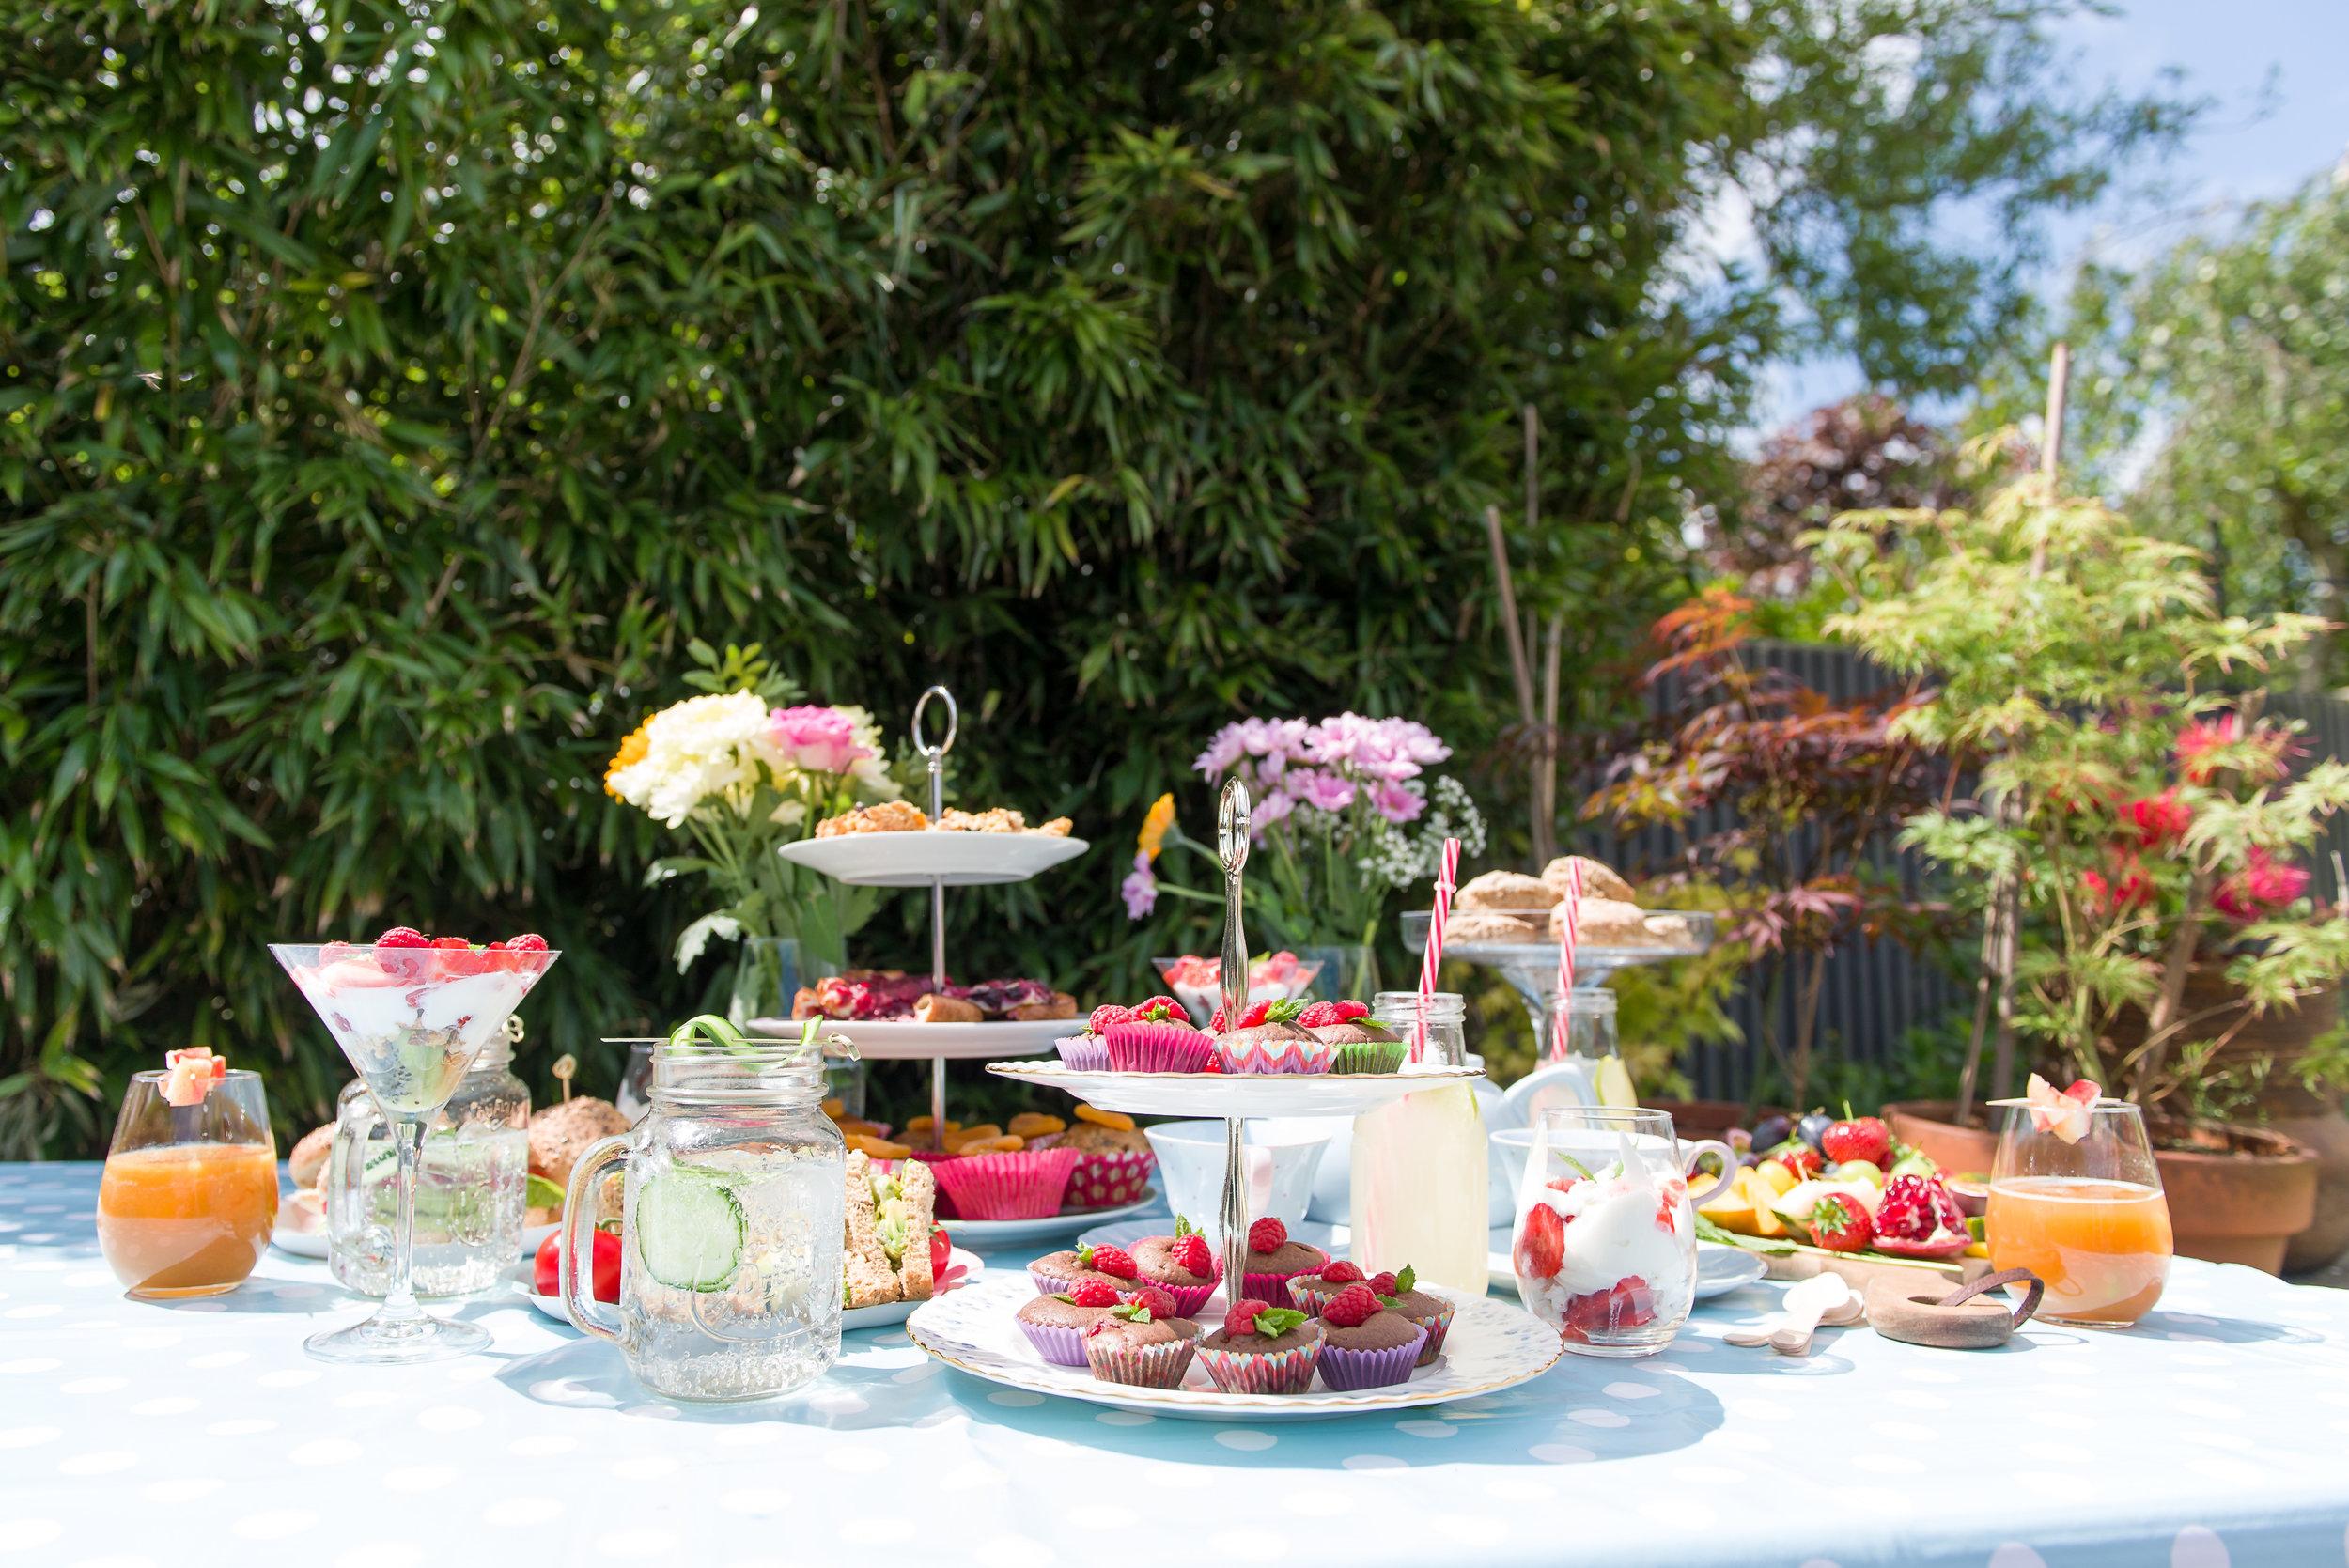 Fruitea Party-1.jpg